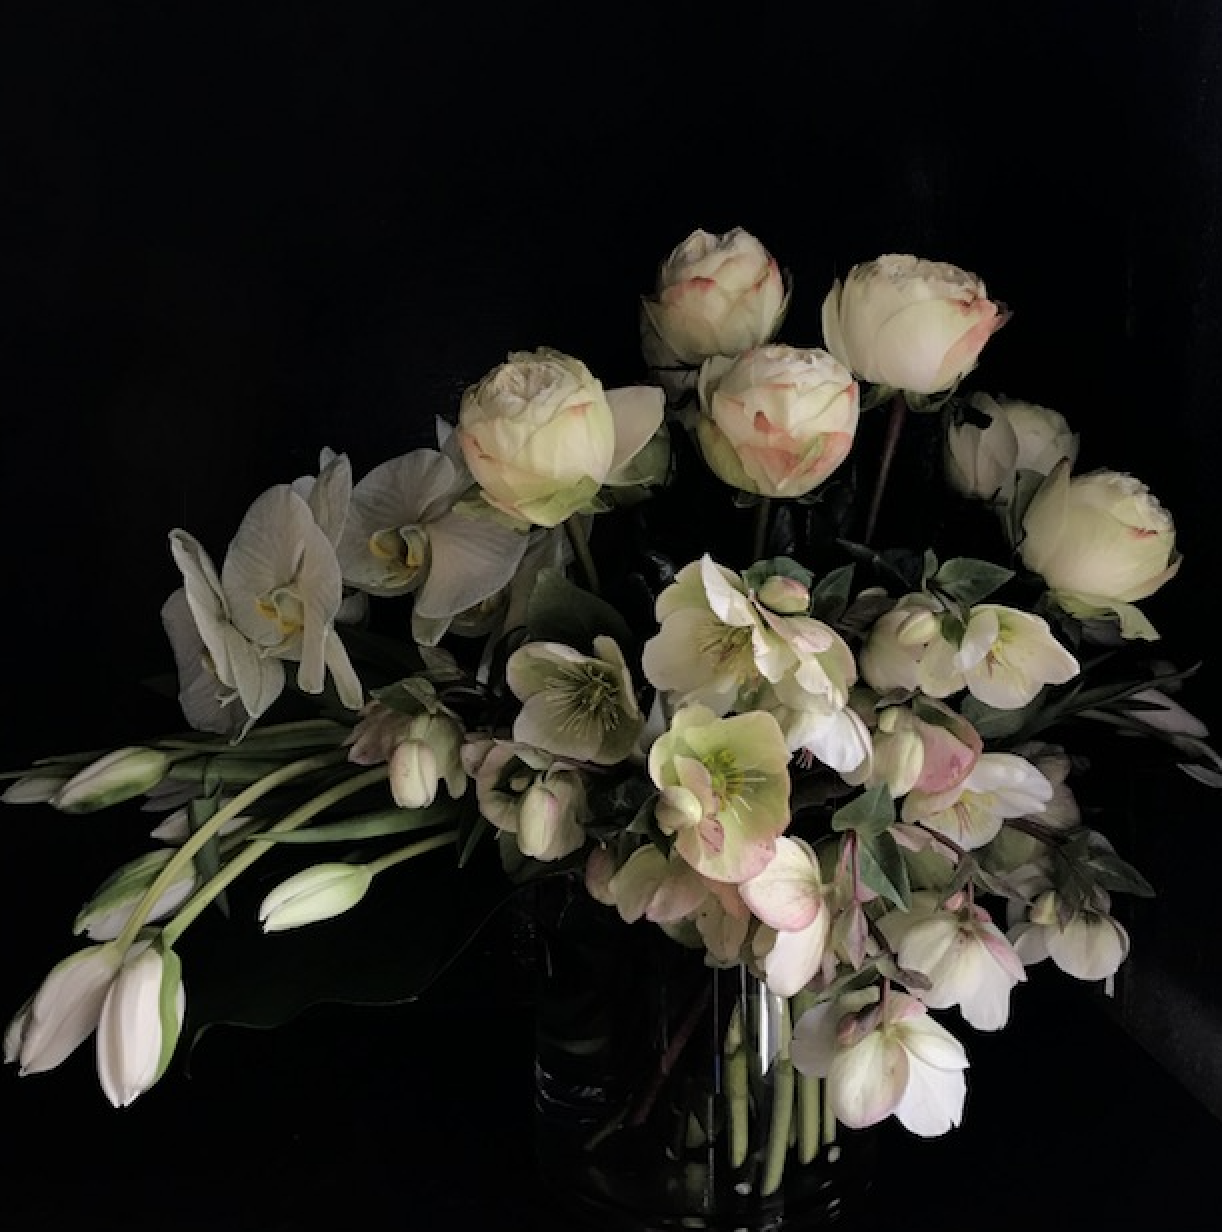 mr-theodore_flowers-vasette_01.jpg